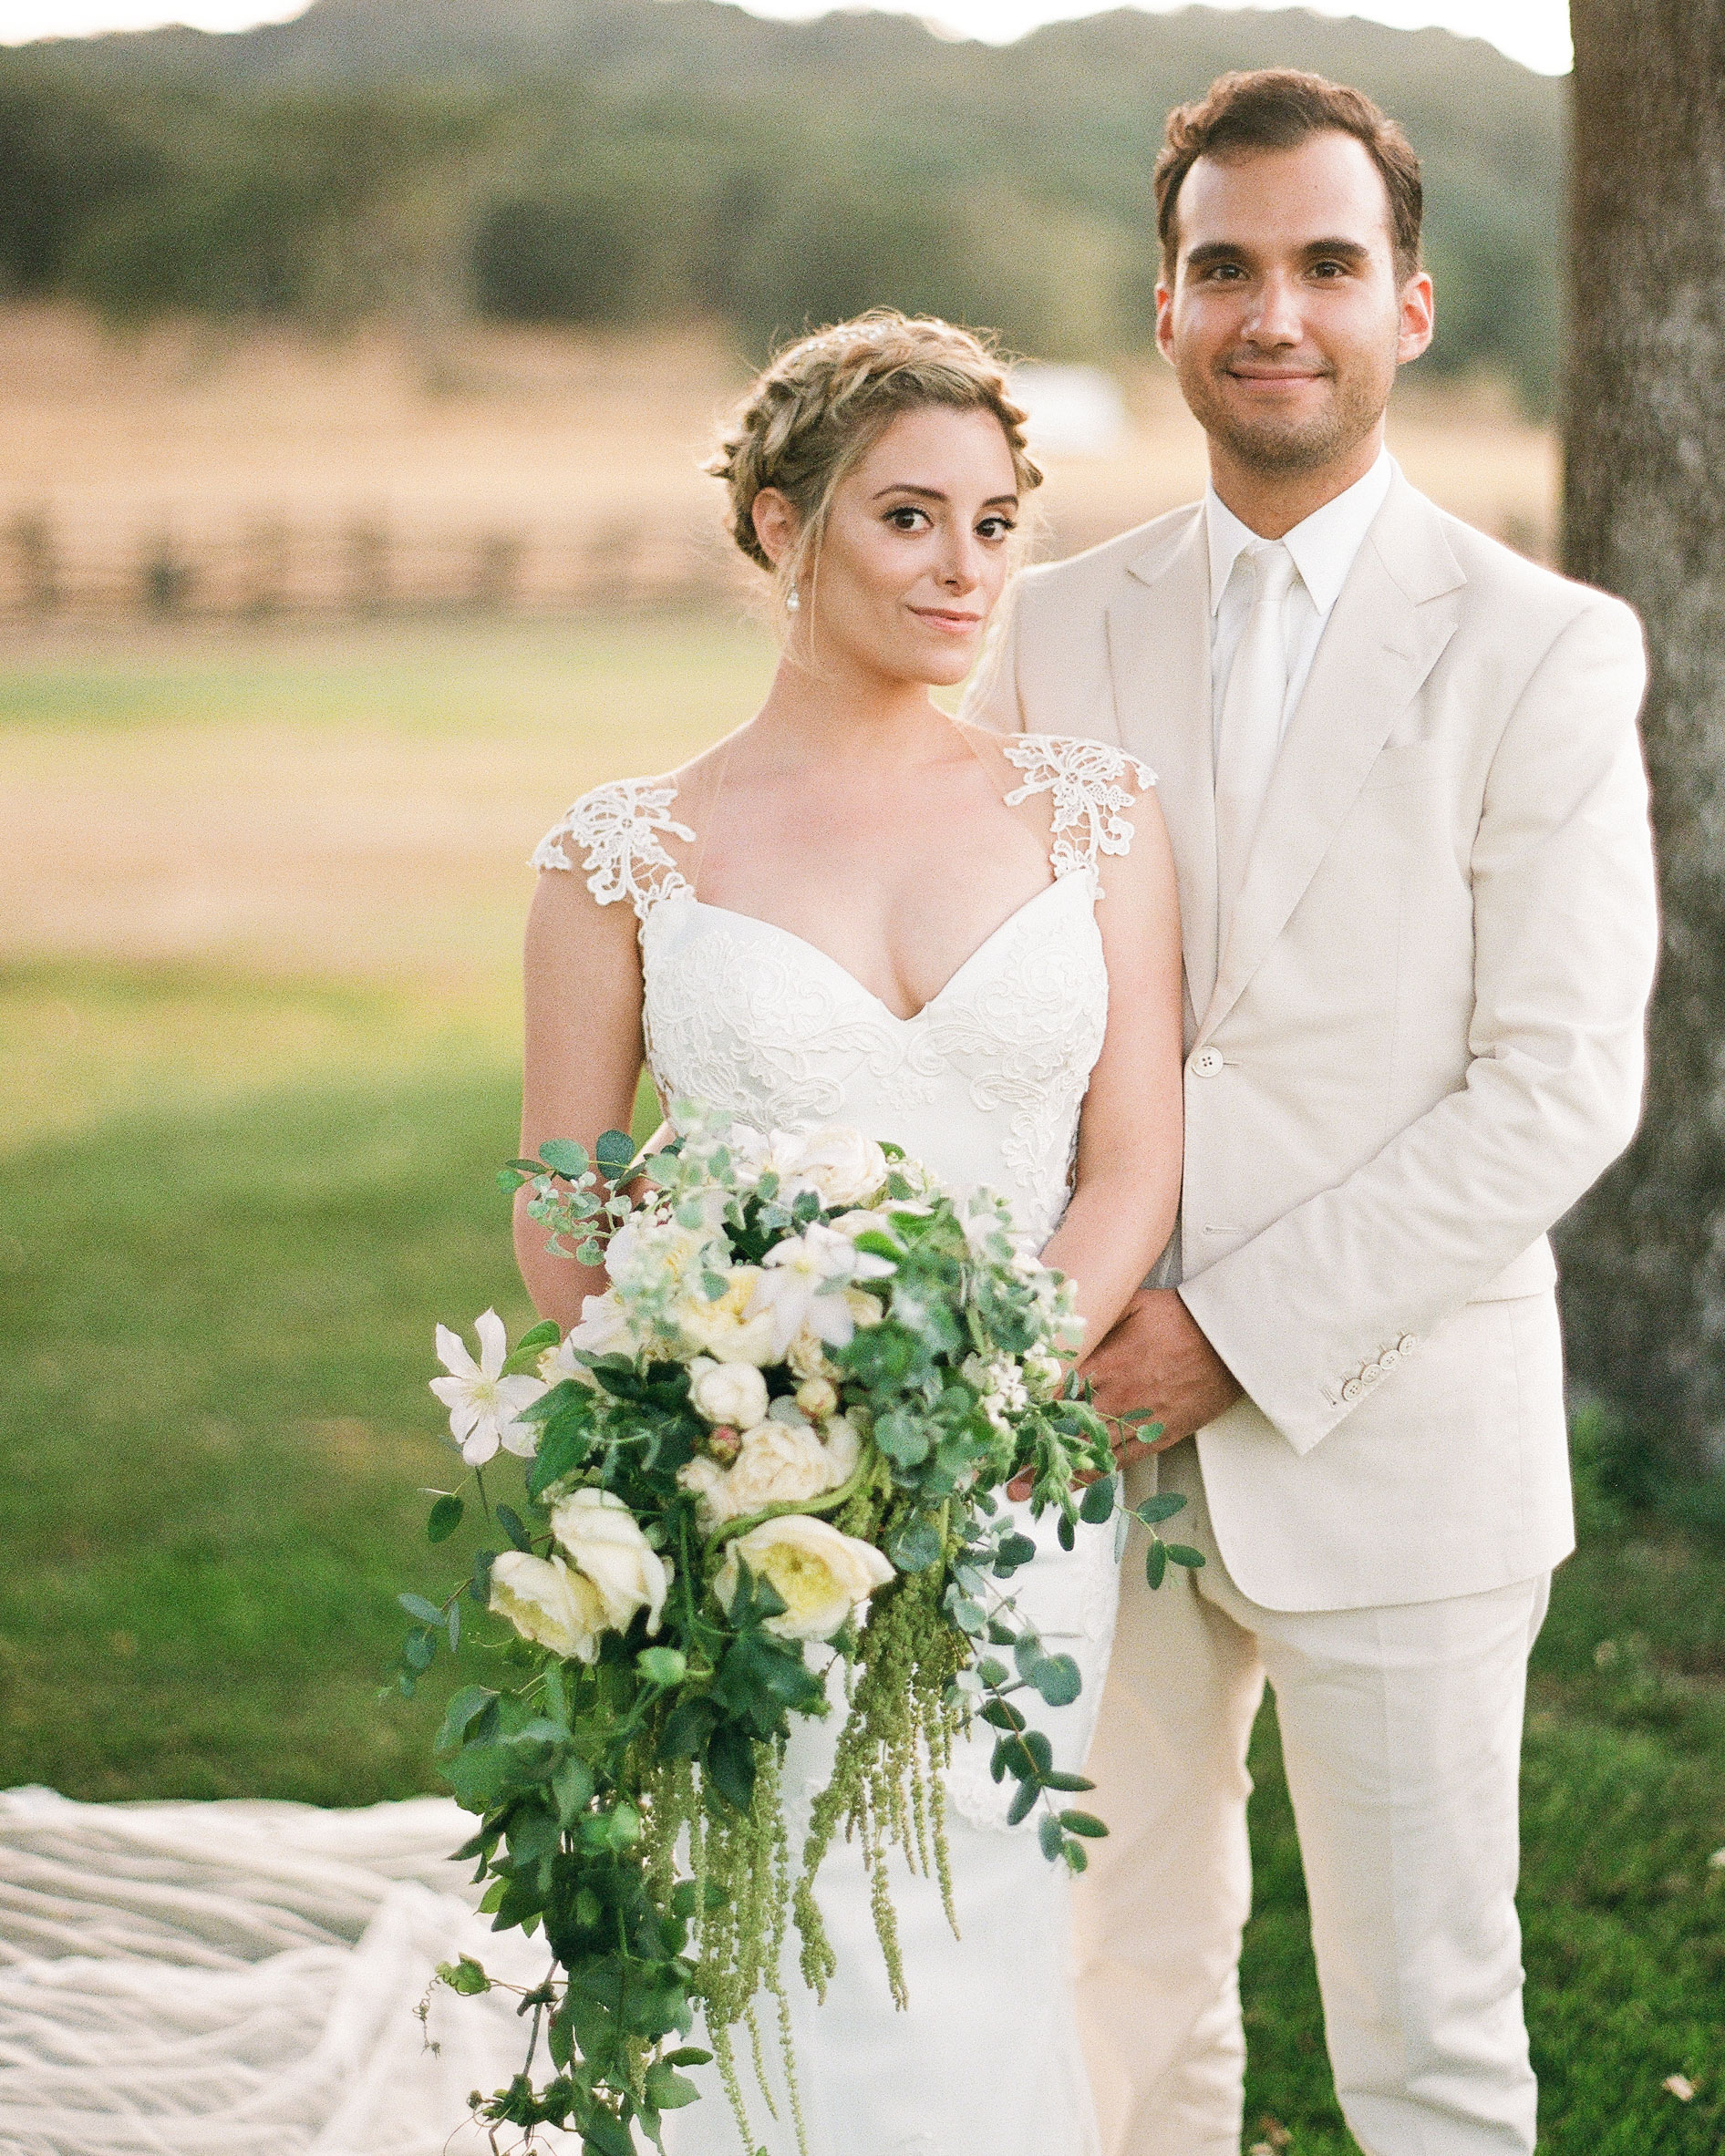 breelayne-hunter-wedding-california-0101-santa-lucia-preserve-fairy-woodsy-organic-couple-s112849.jpg